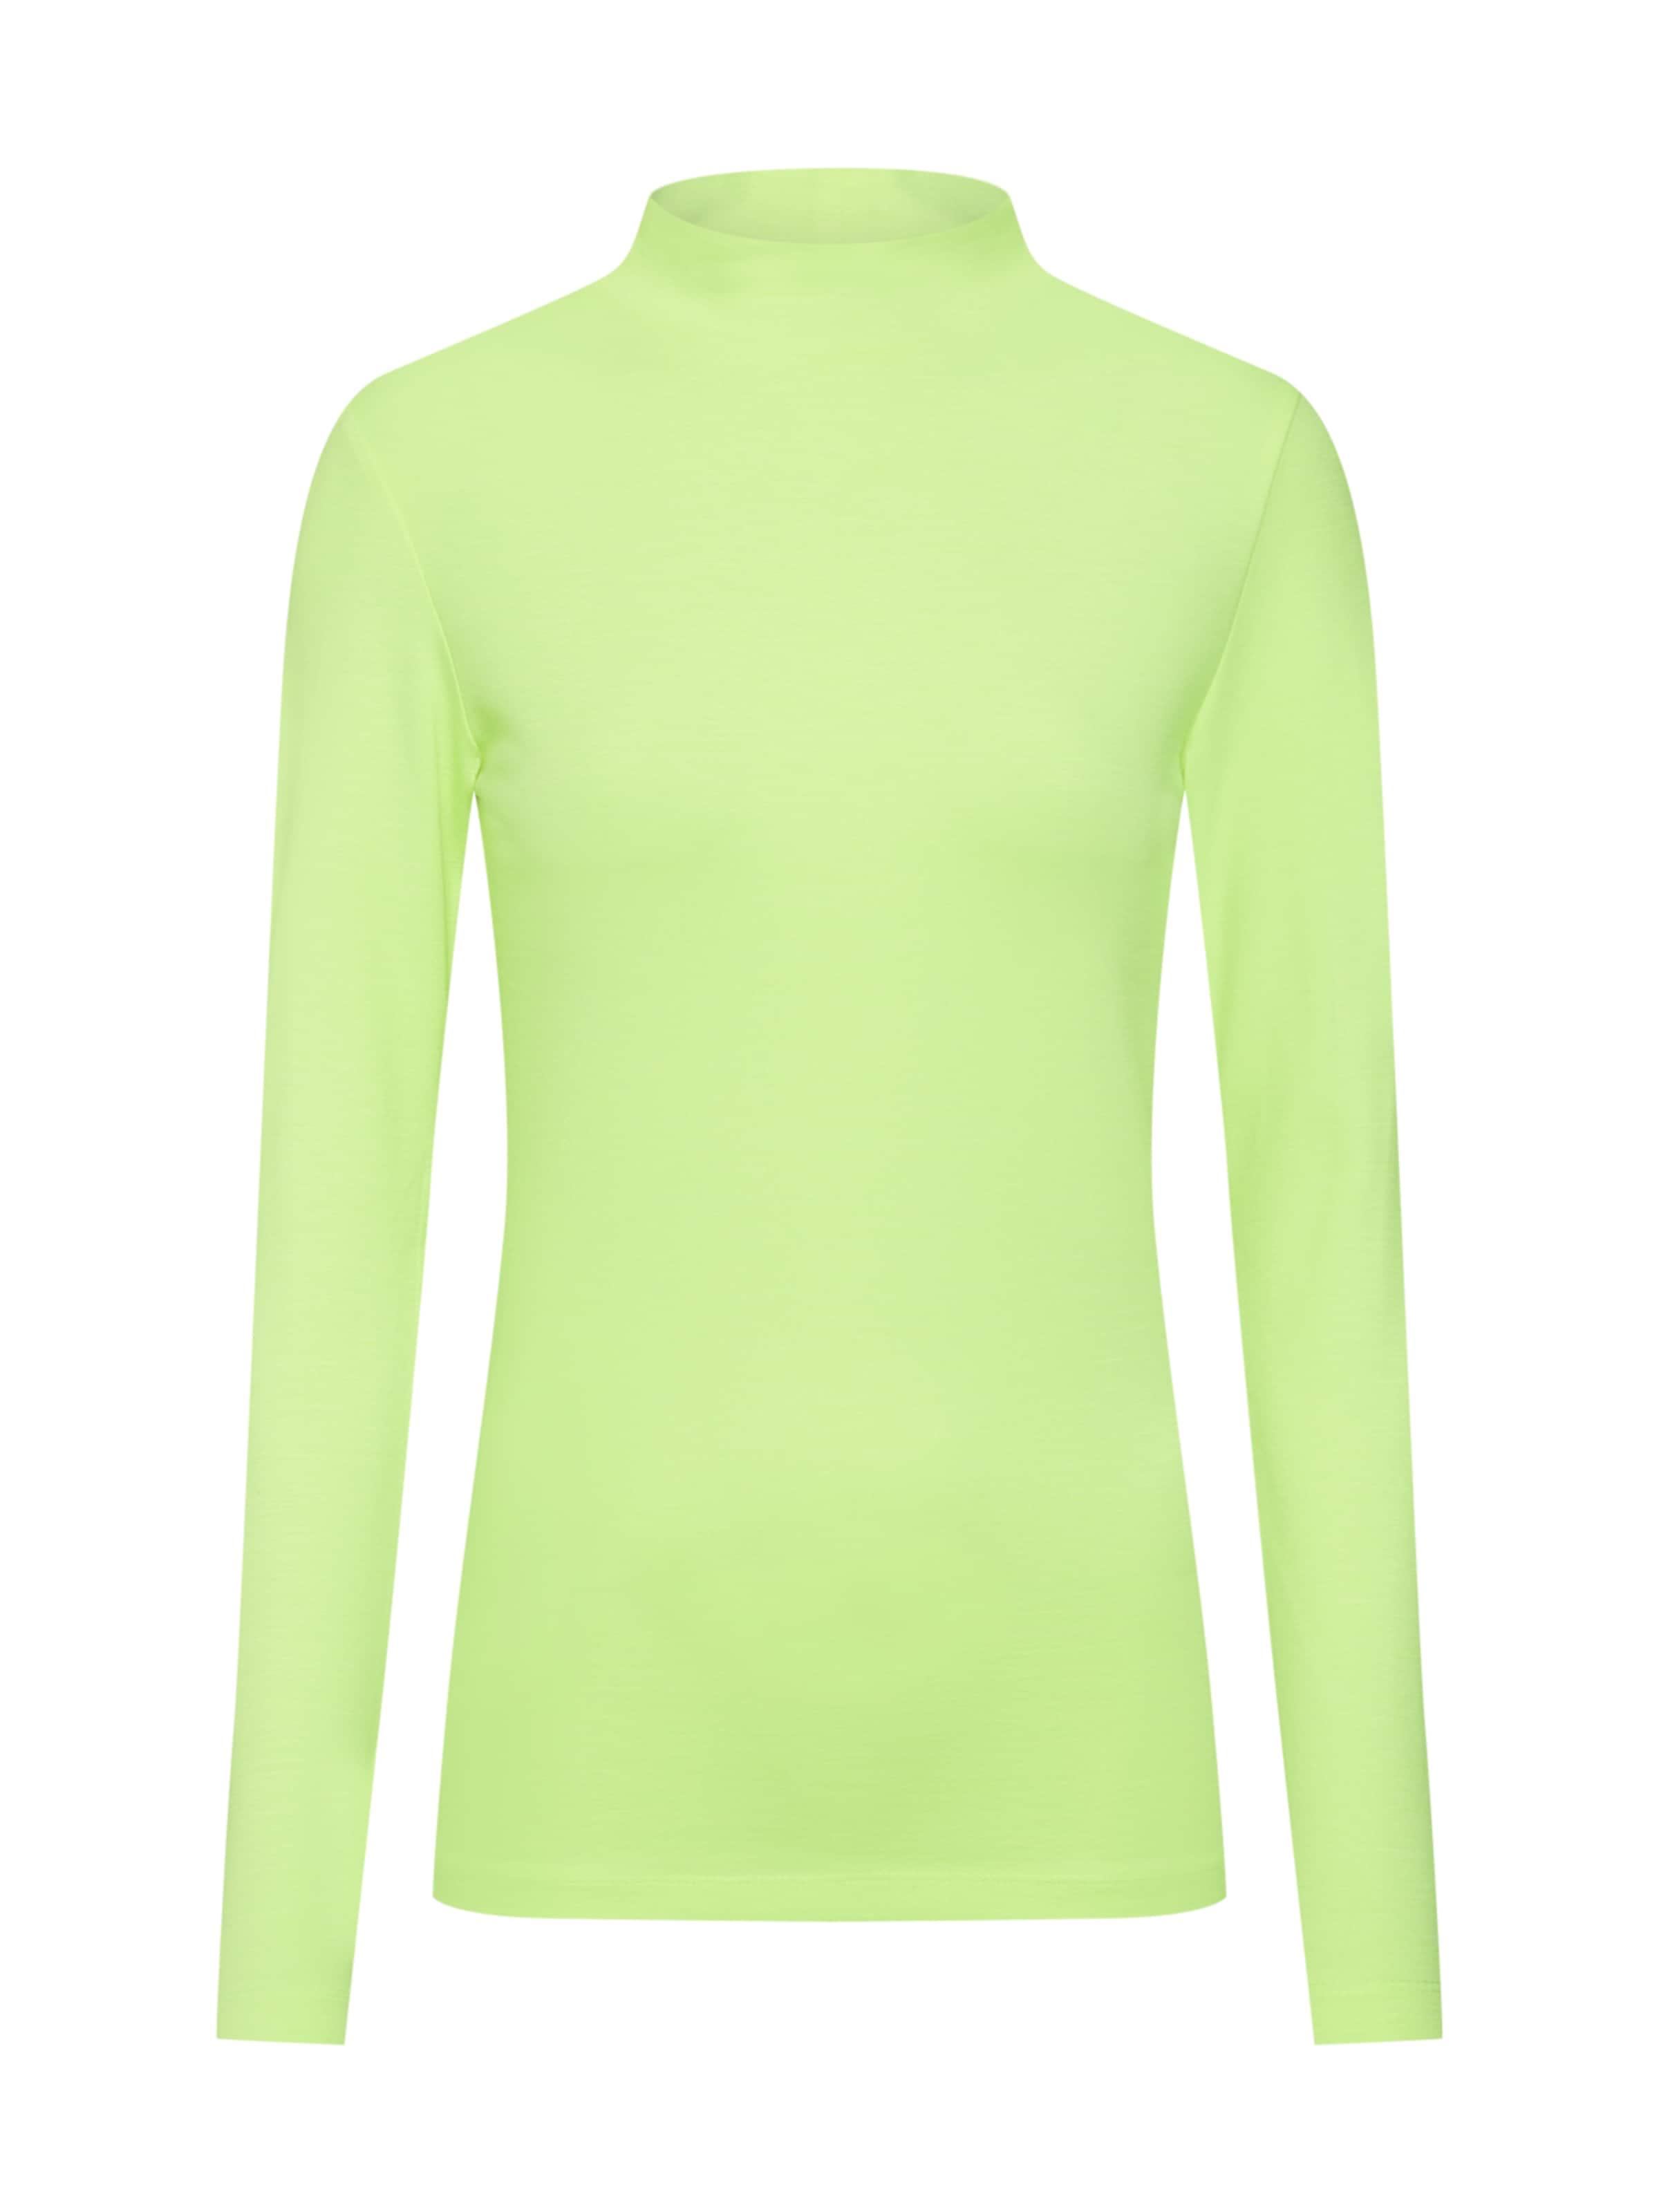 Neongelb Drykorn Shirt Shirt Drykorn 'klea' In 'klea' In Neongelb Drykorn Shirt 0Pwk8nXO